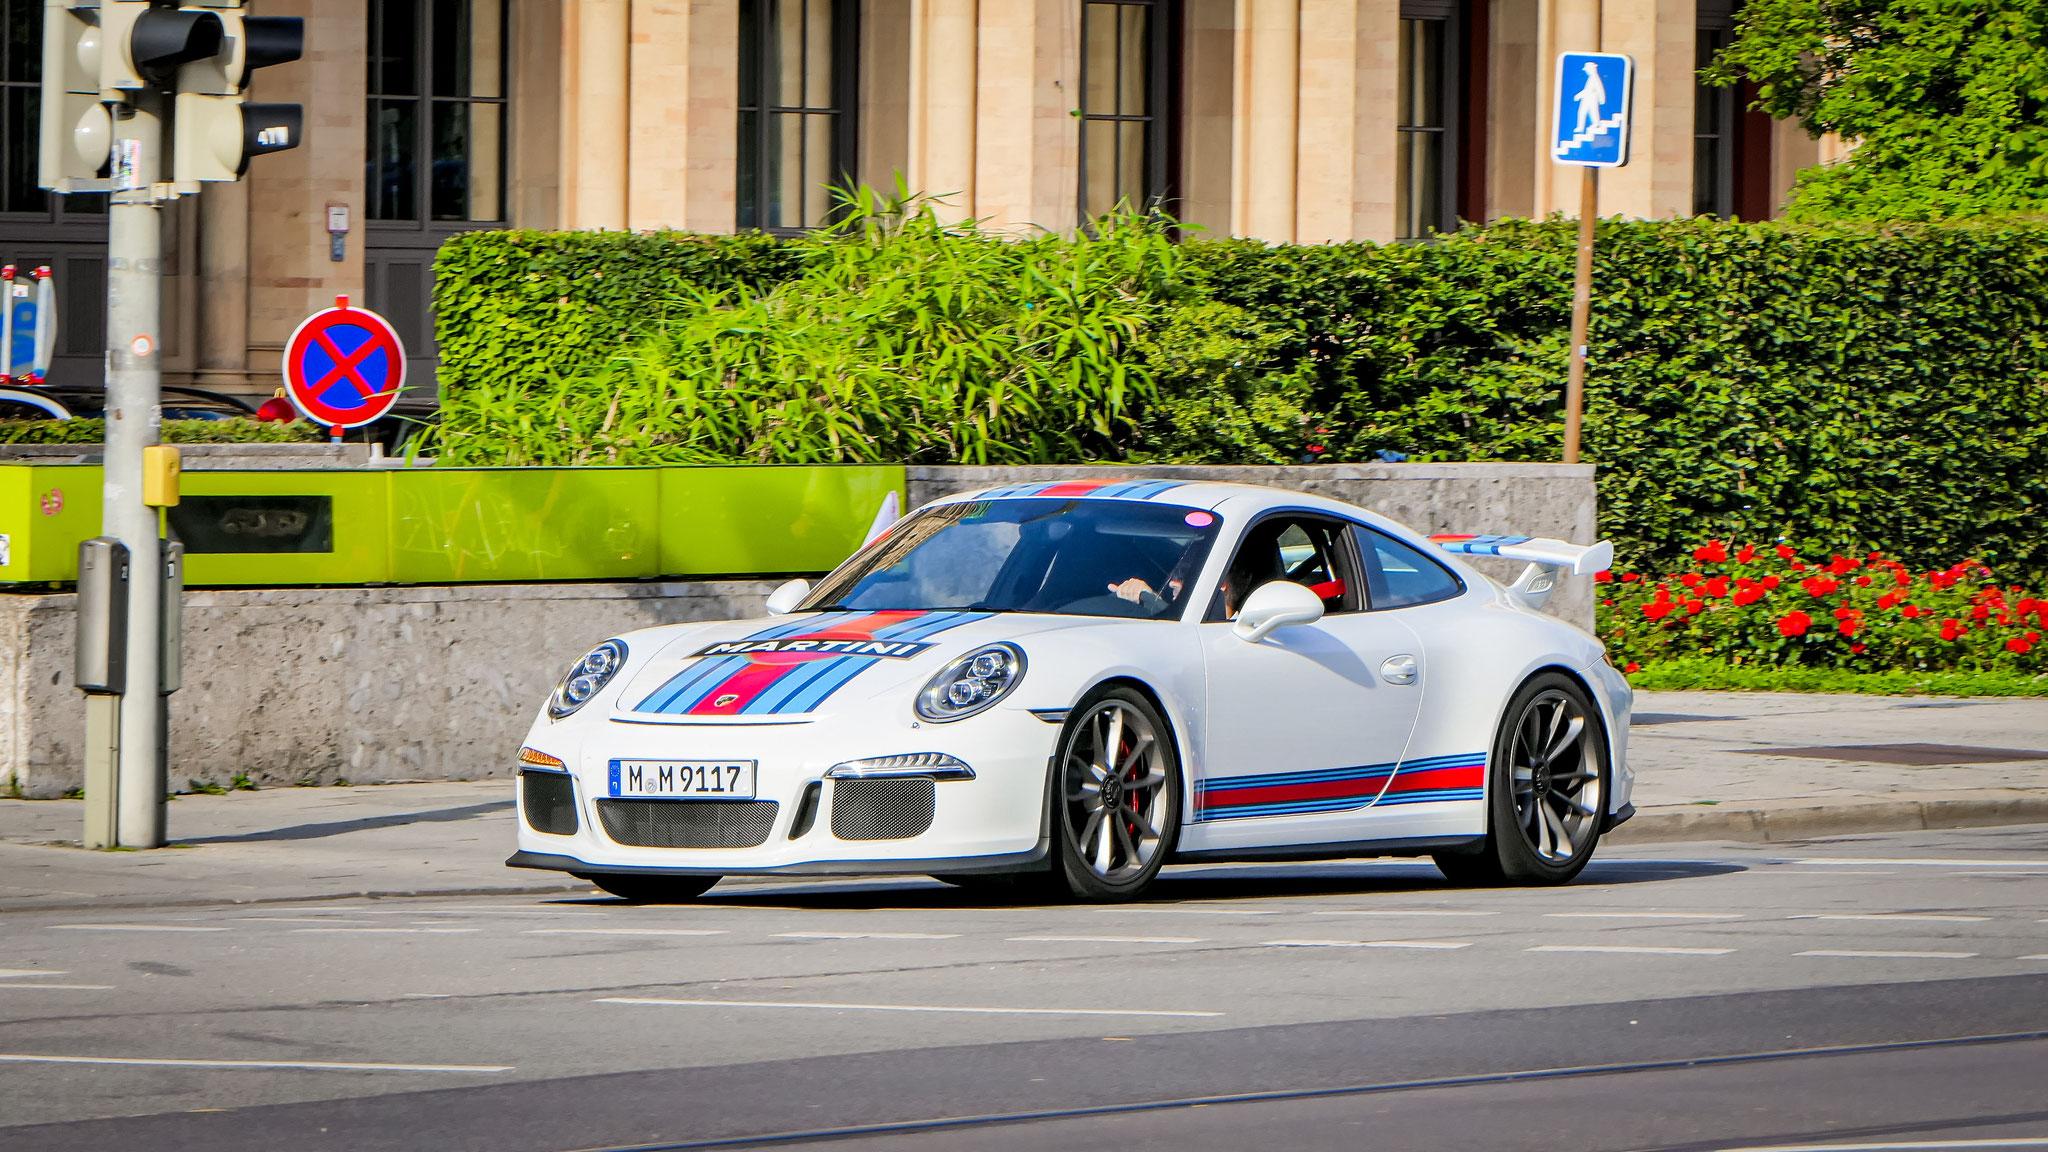 Porsche 991 GT3 - M-M-9117